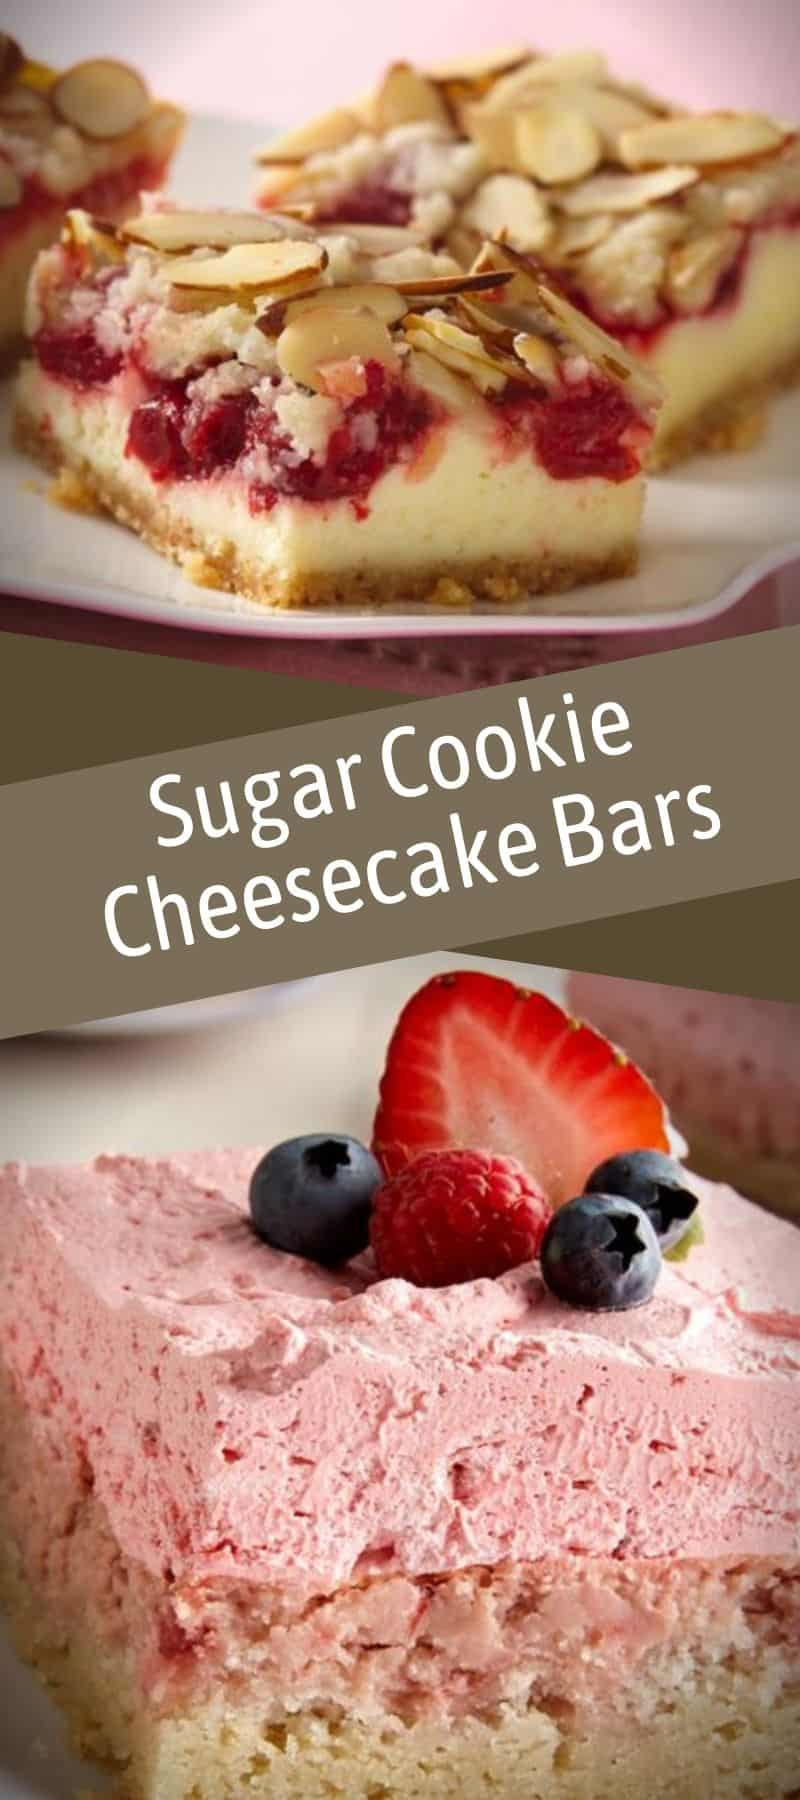 Sugar Cookie Cheesecake Bars Recipe 3